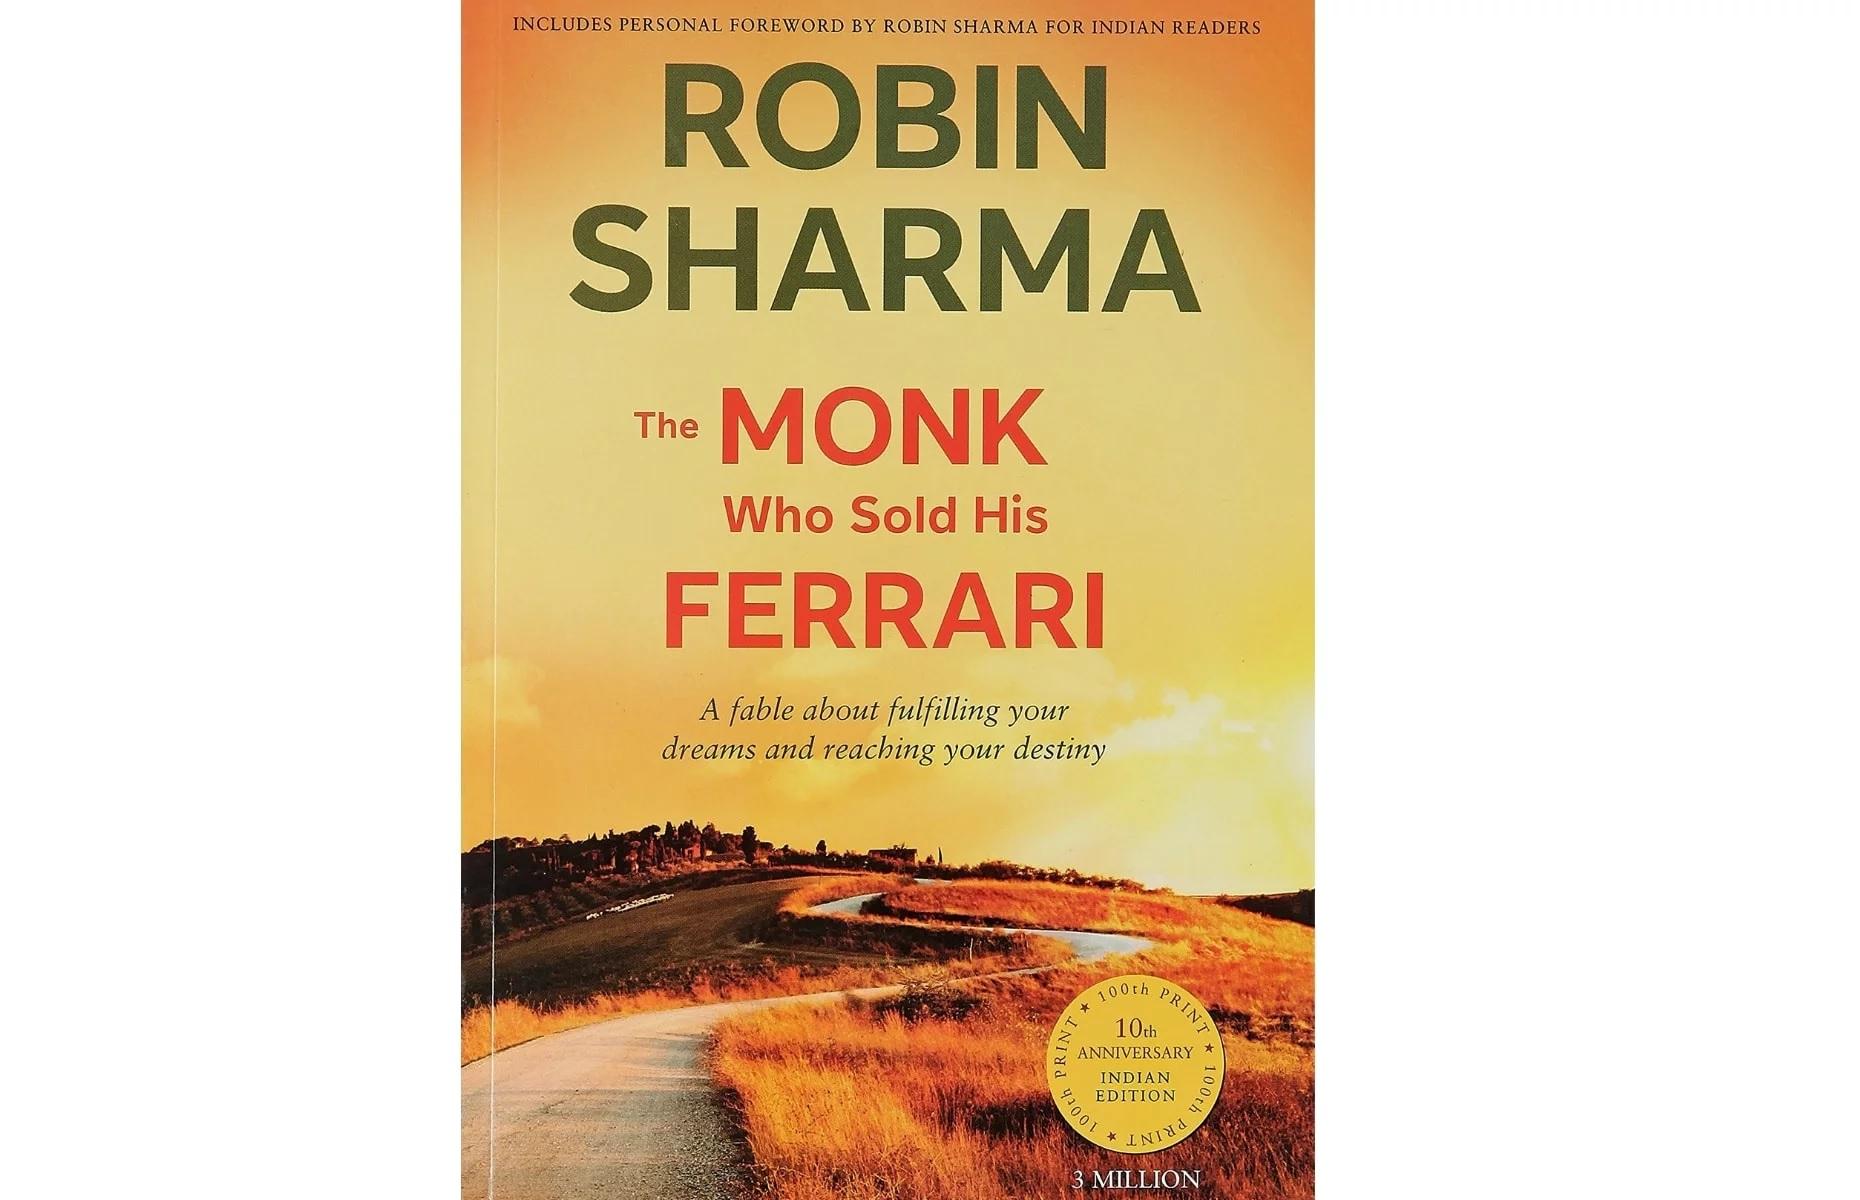 #14 The-monk-who-sold-his-farrari